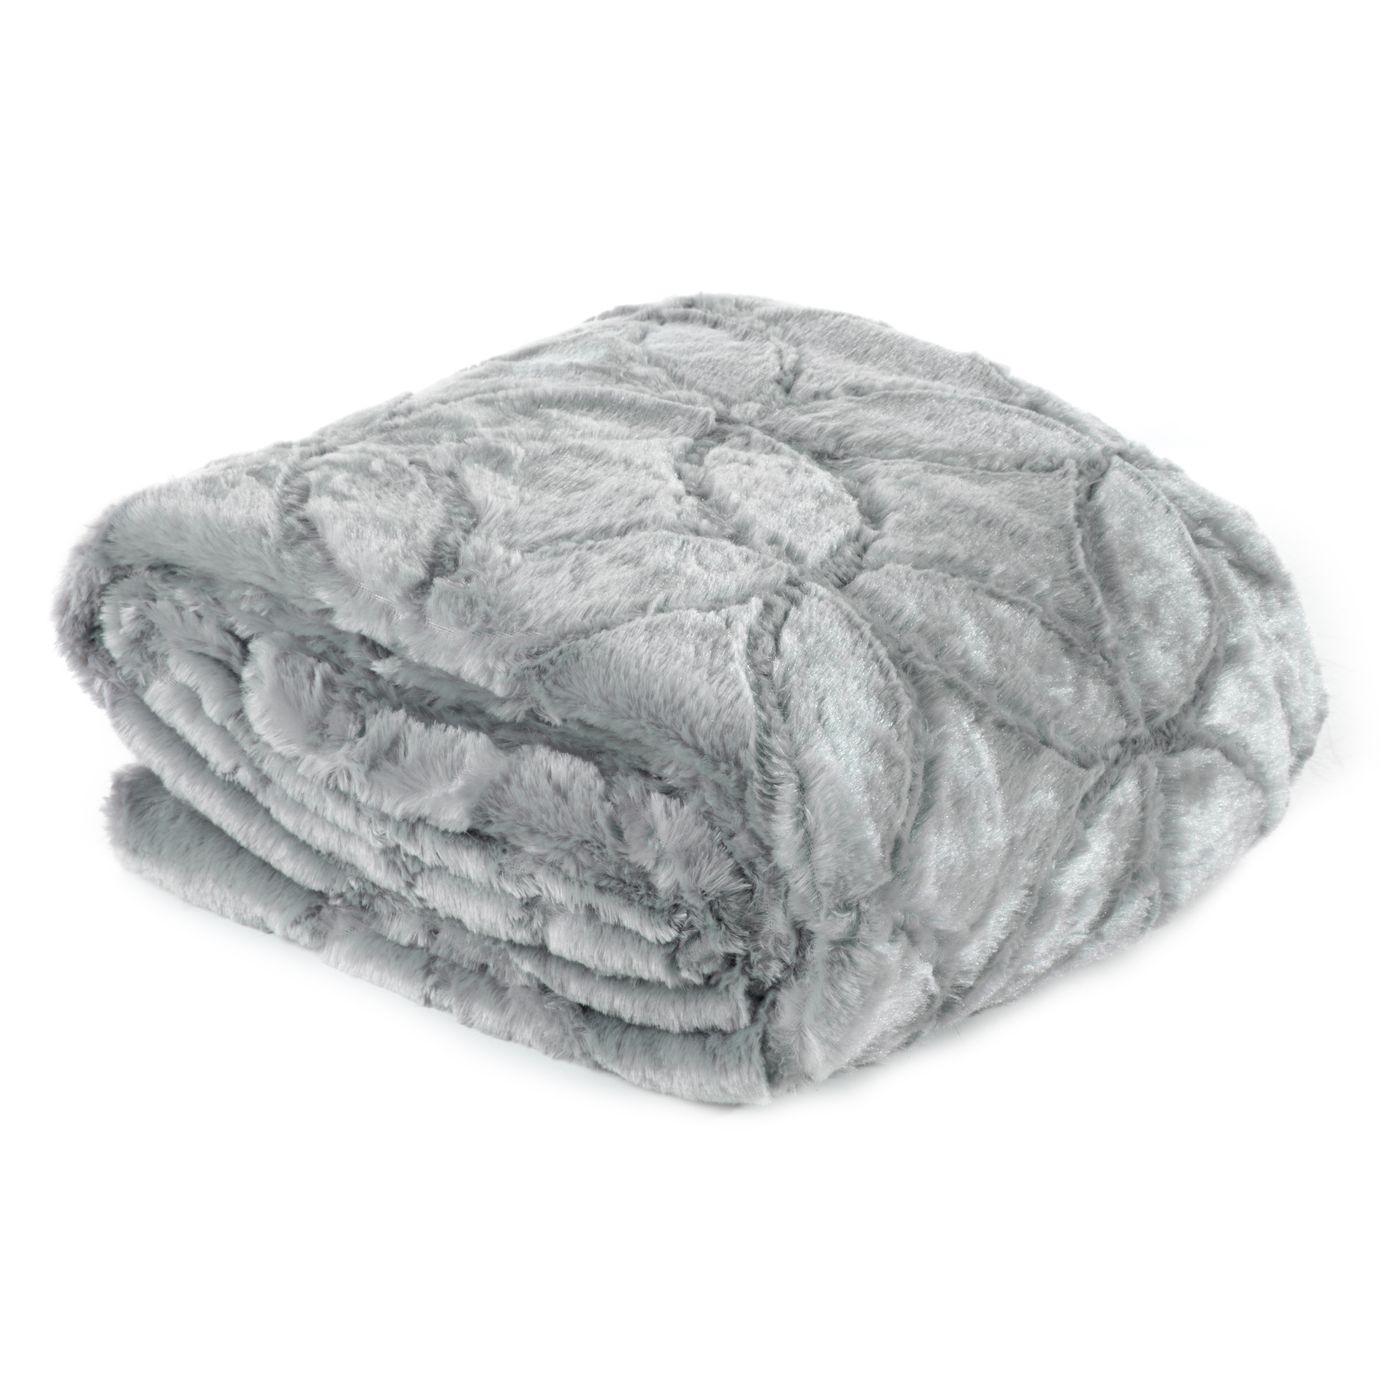 Narzuta futerko na łóżko srebrny szary 170x210 cm